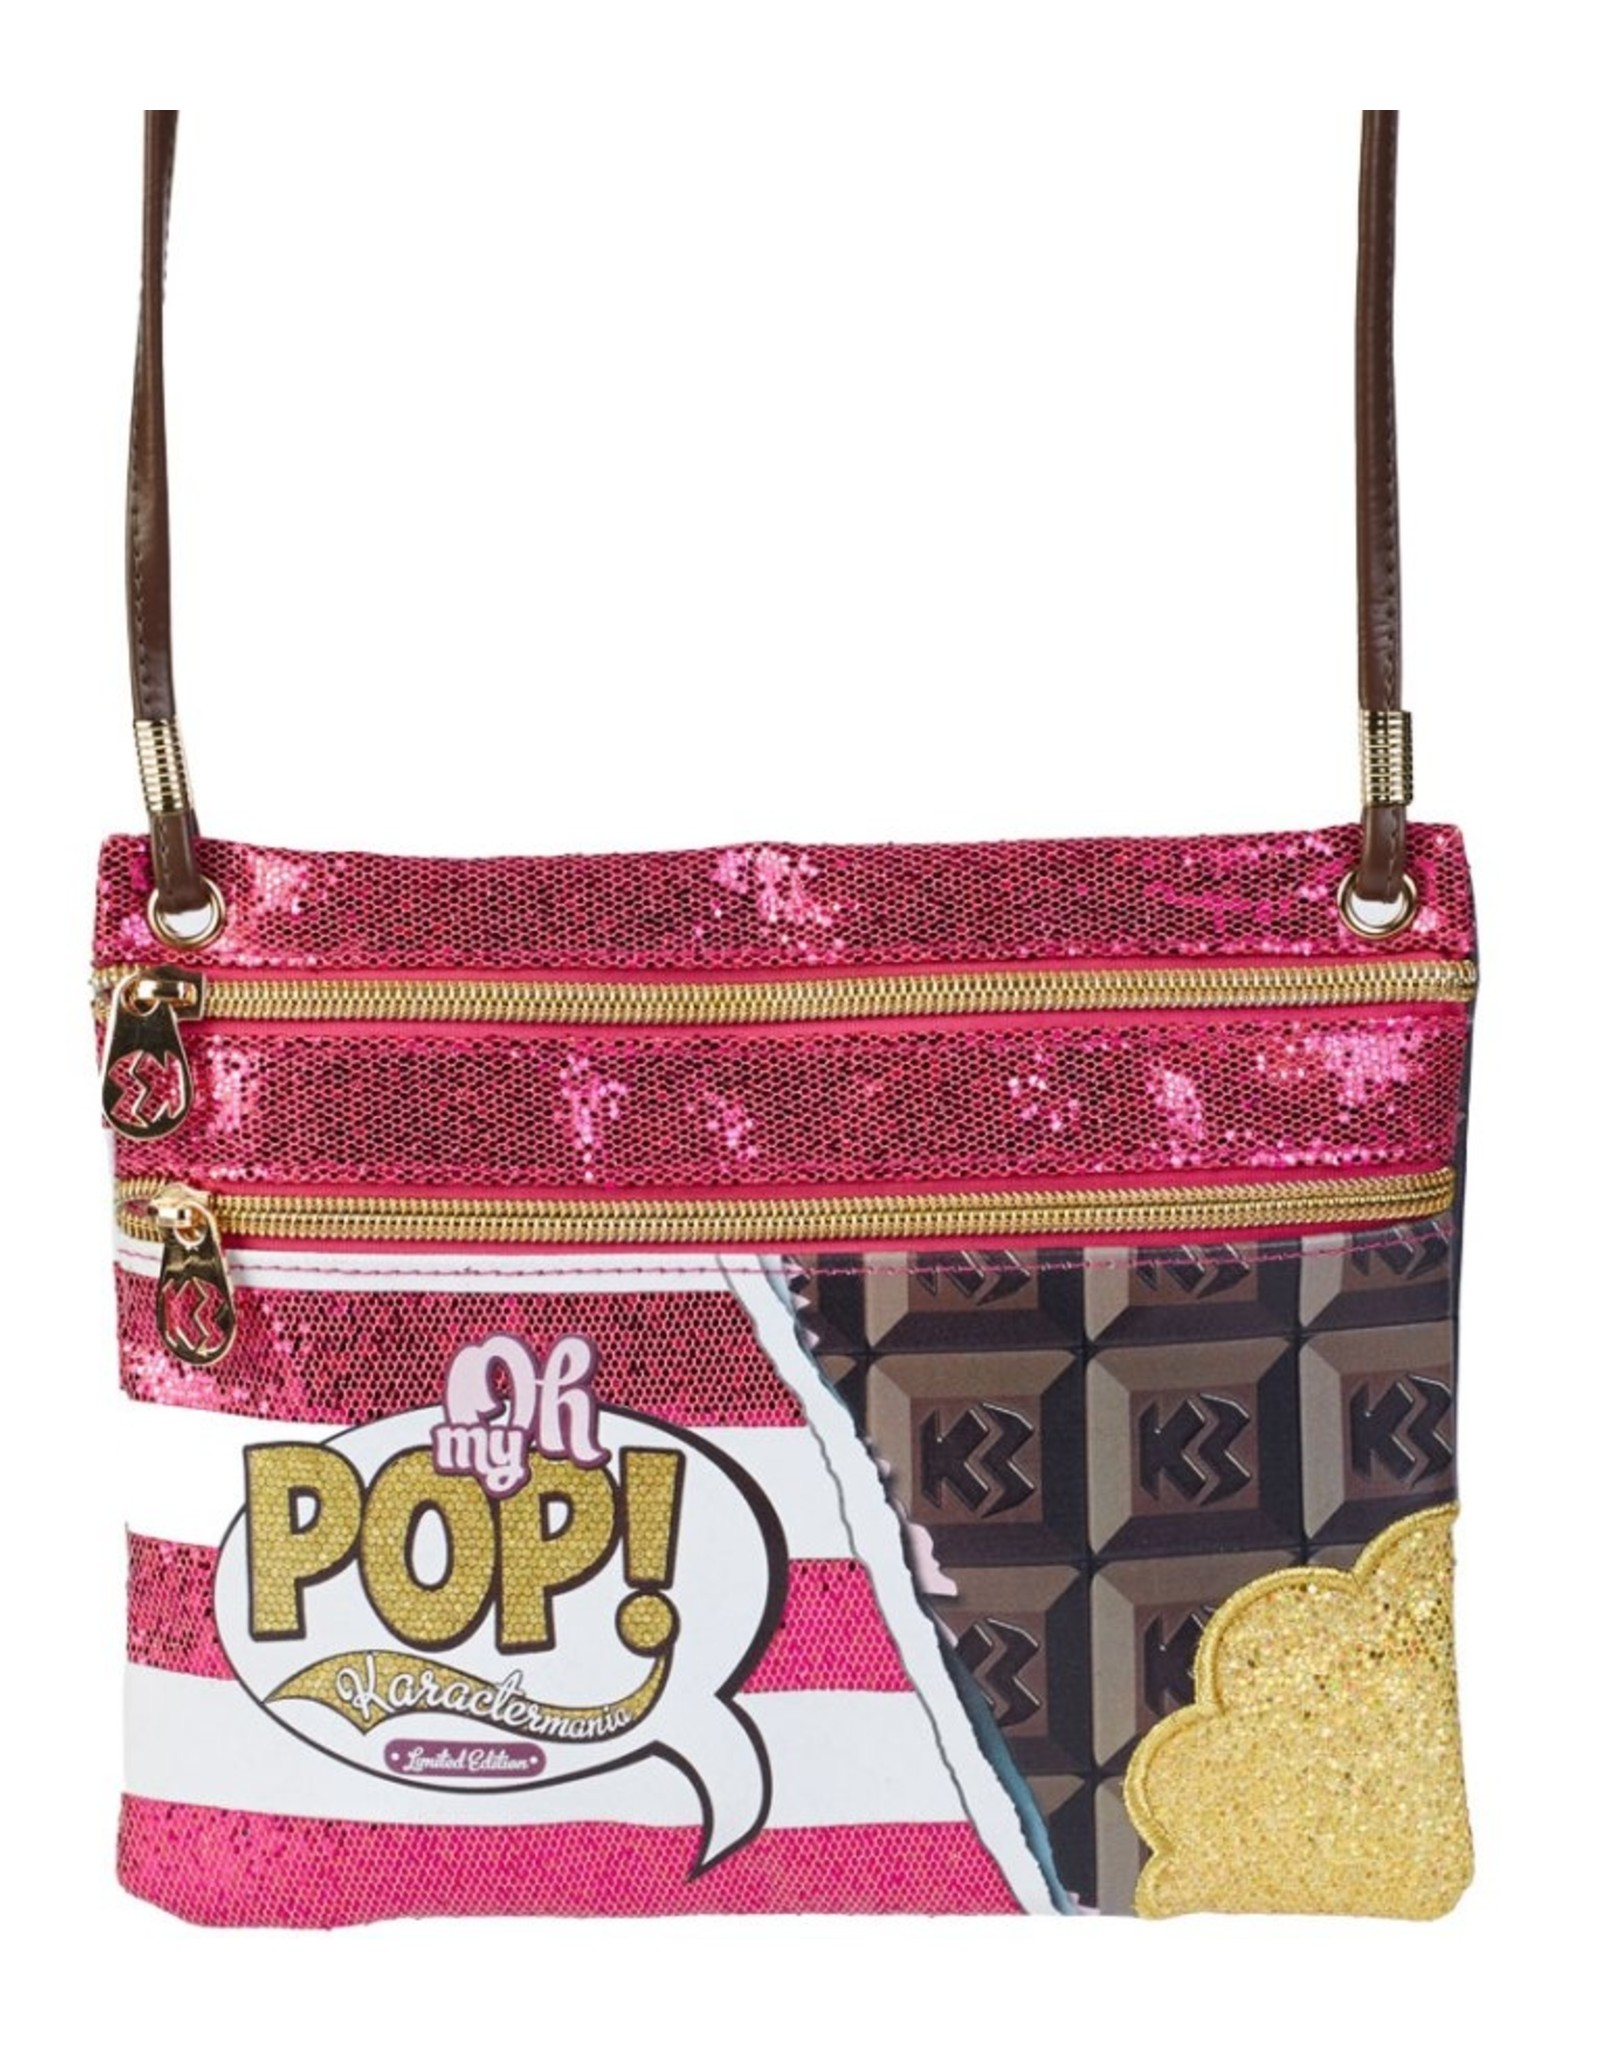 Oh my Pop! Fantasy tassen en portemonnees - Oh My Pop! Chocola schoudertas